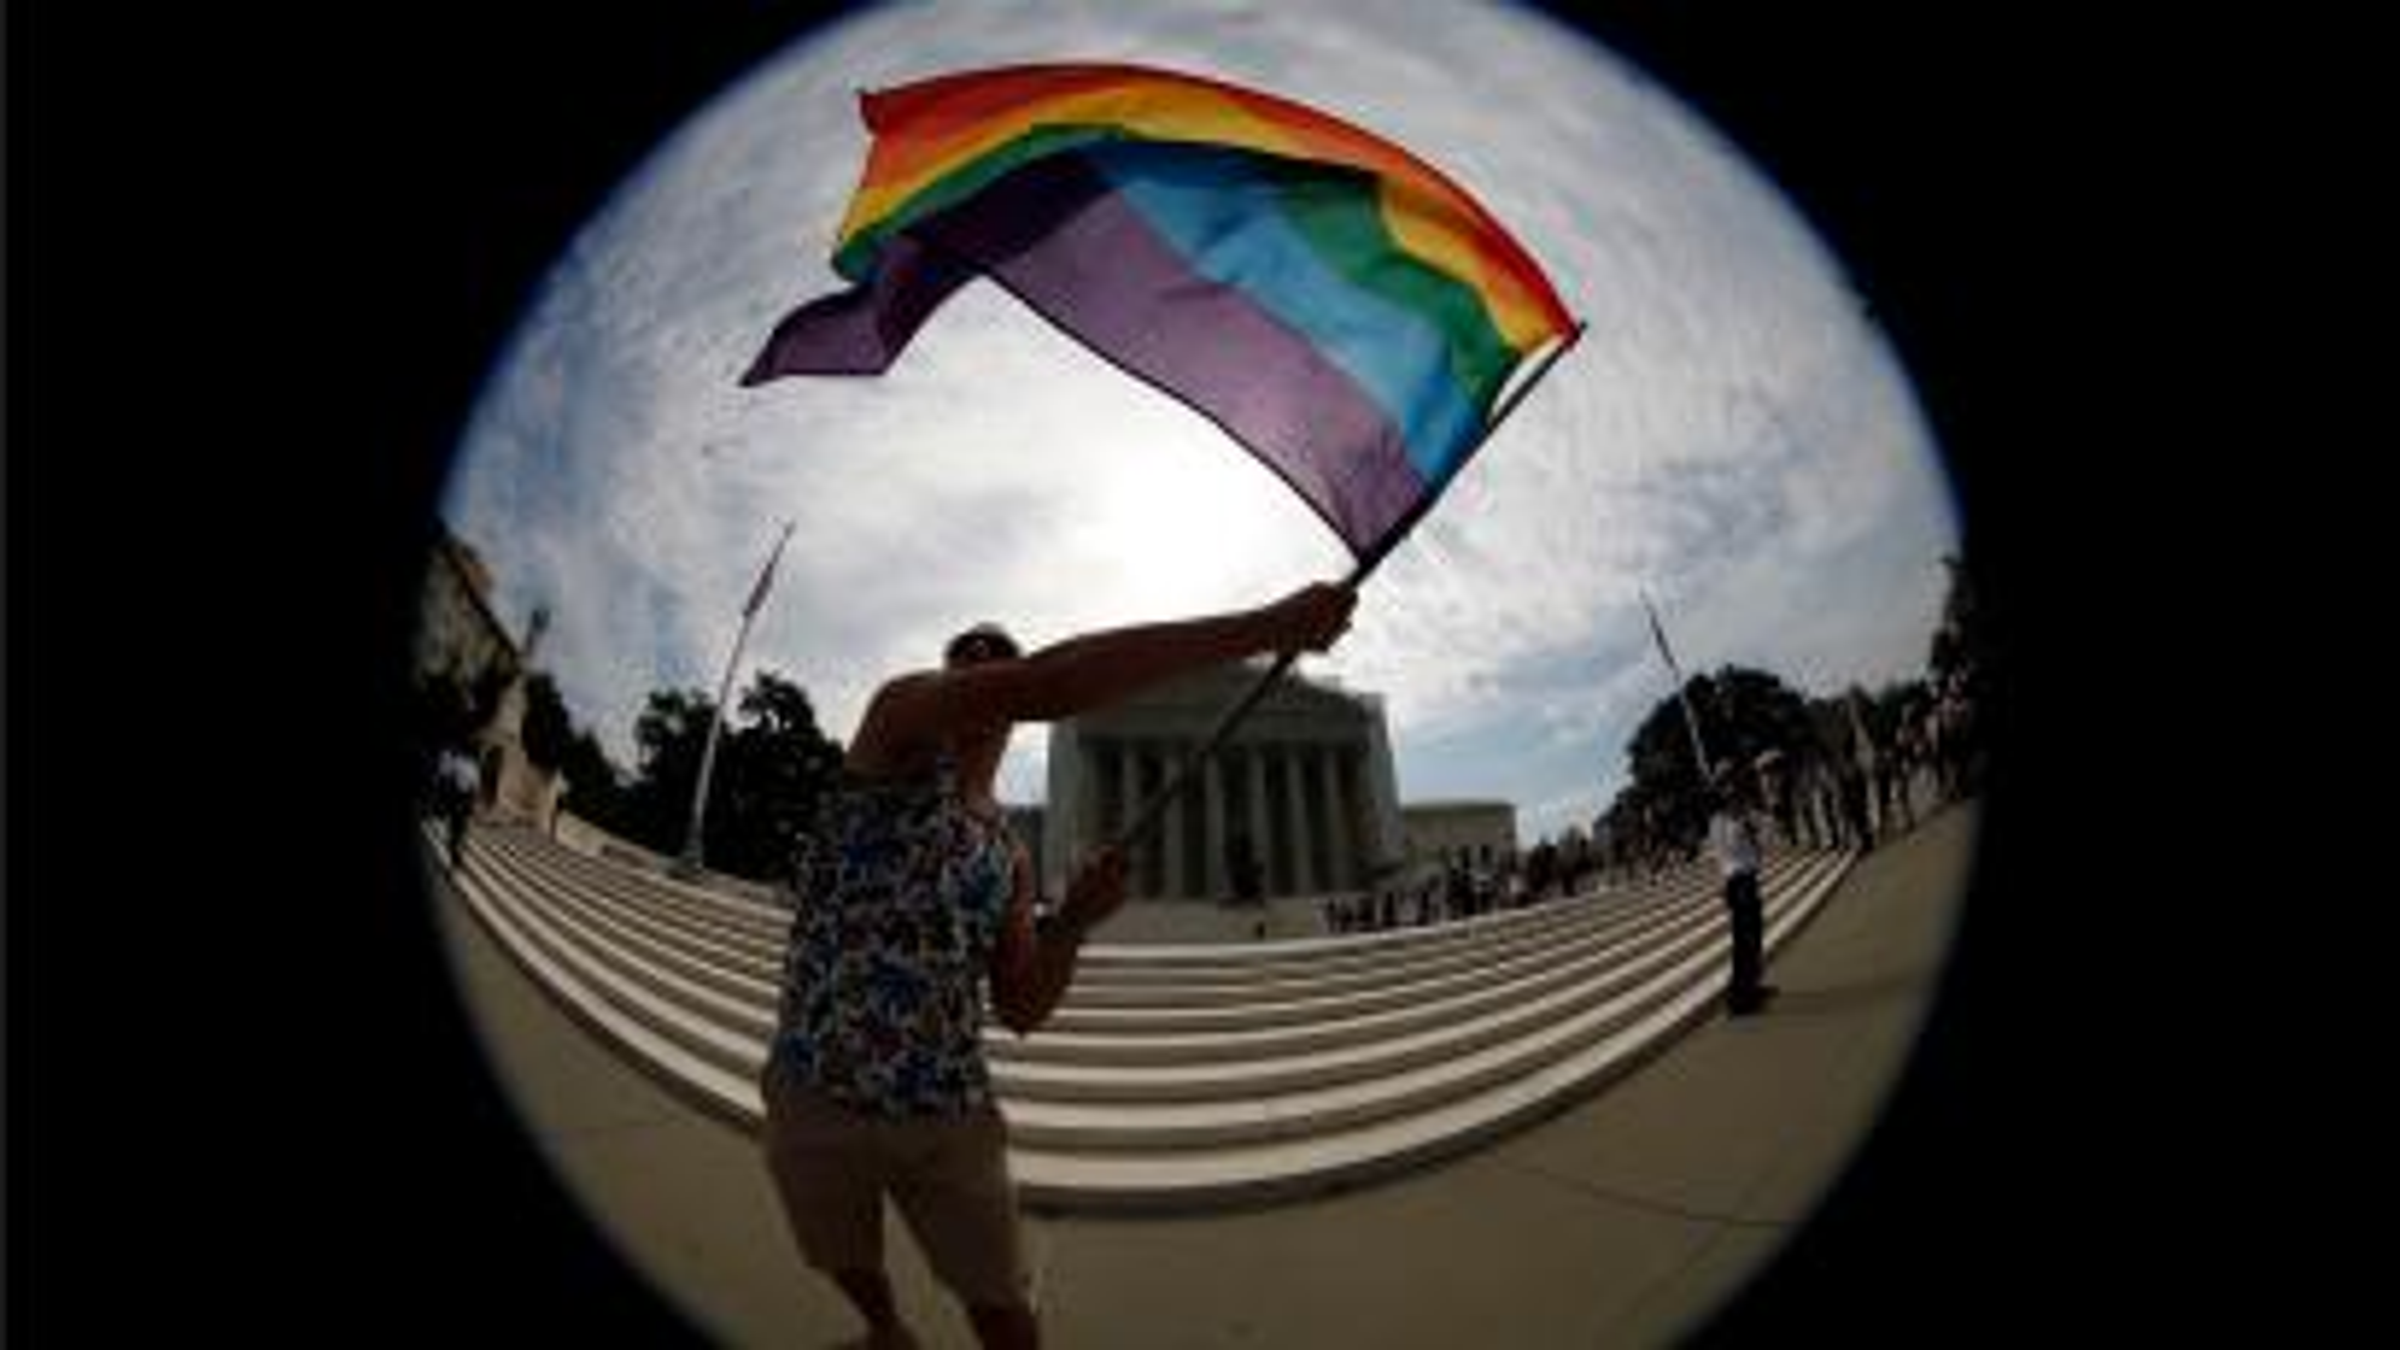 Man waving rainbow flag.